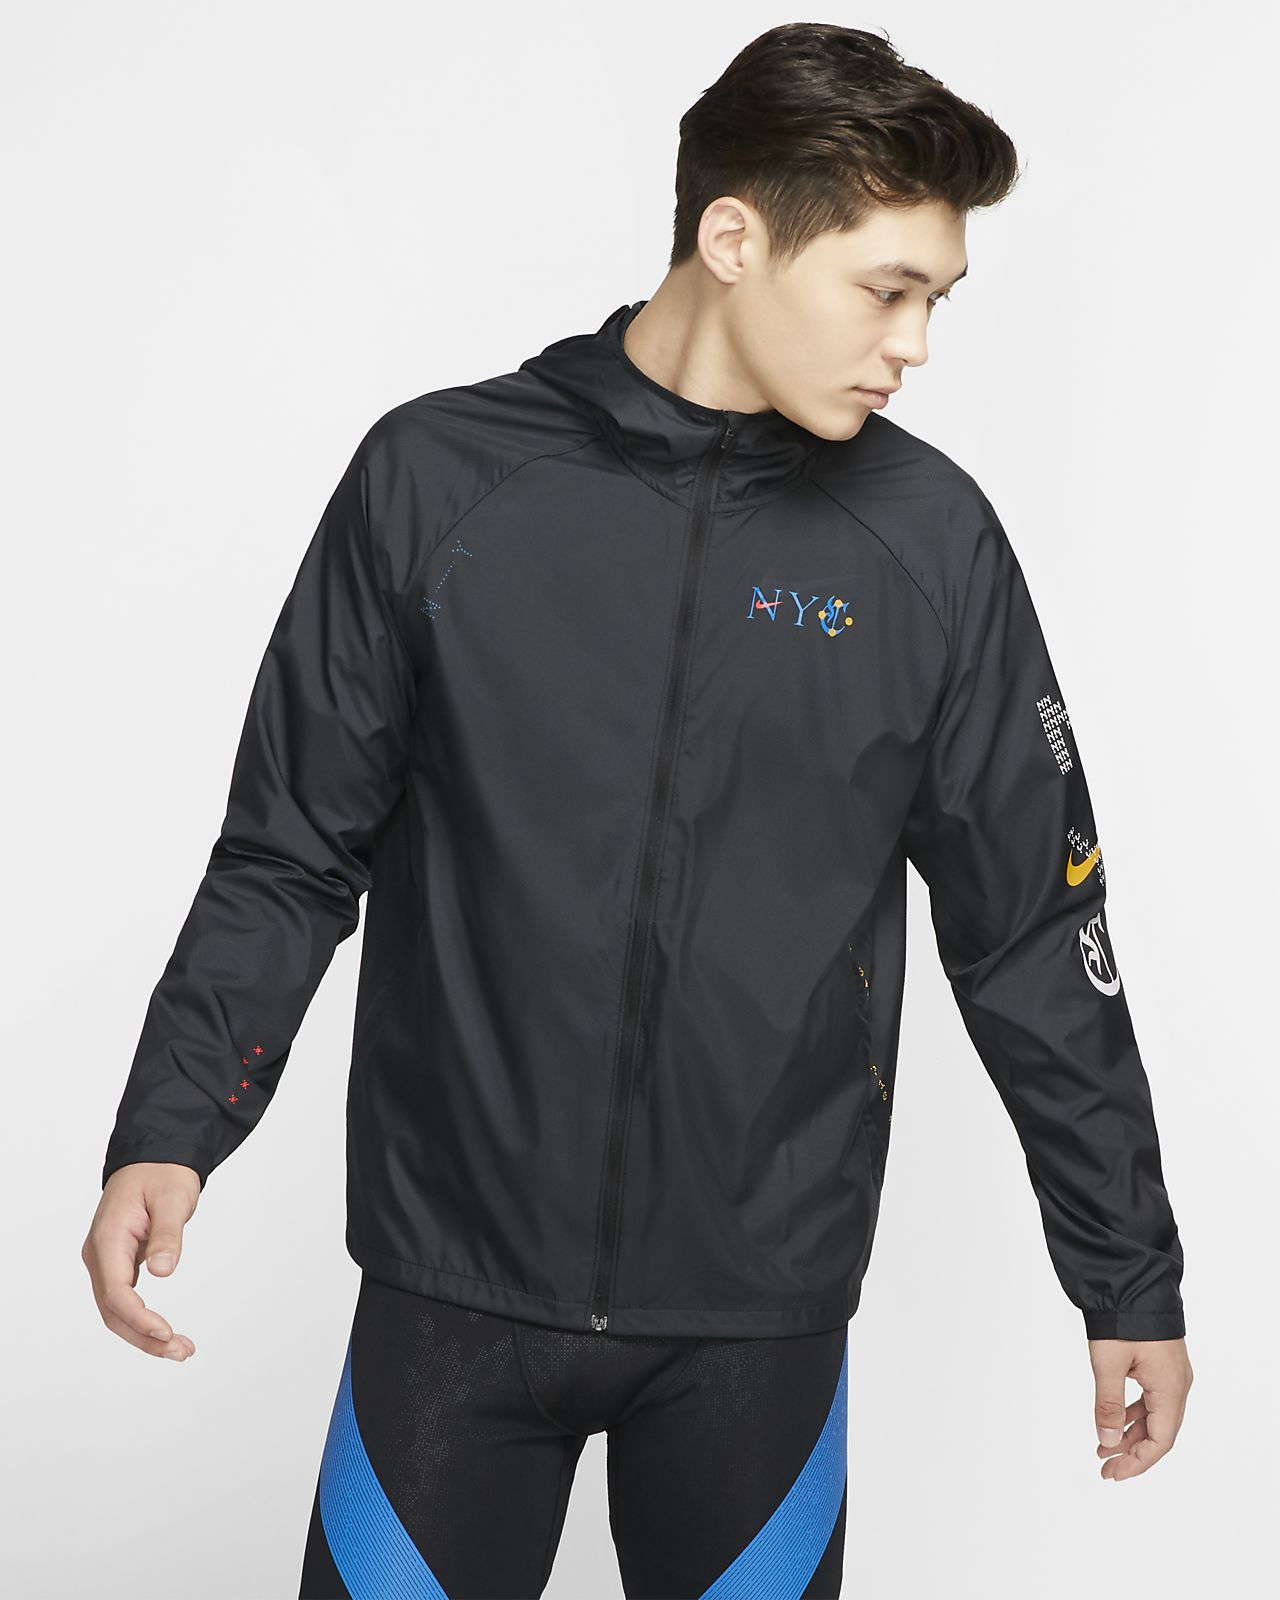 Veste de running Nike Repel NYC pour Homme